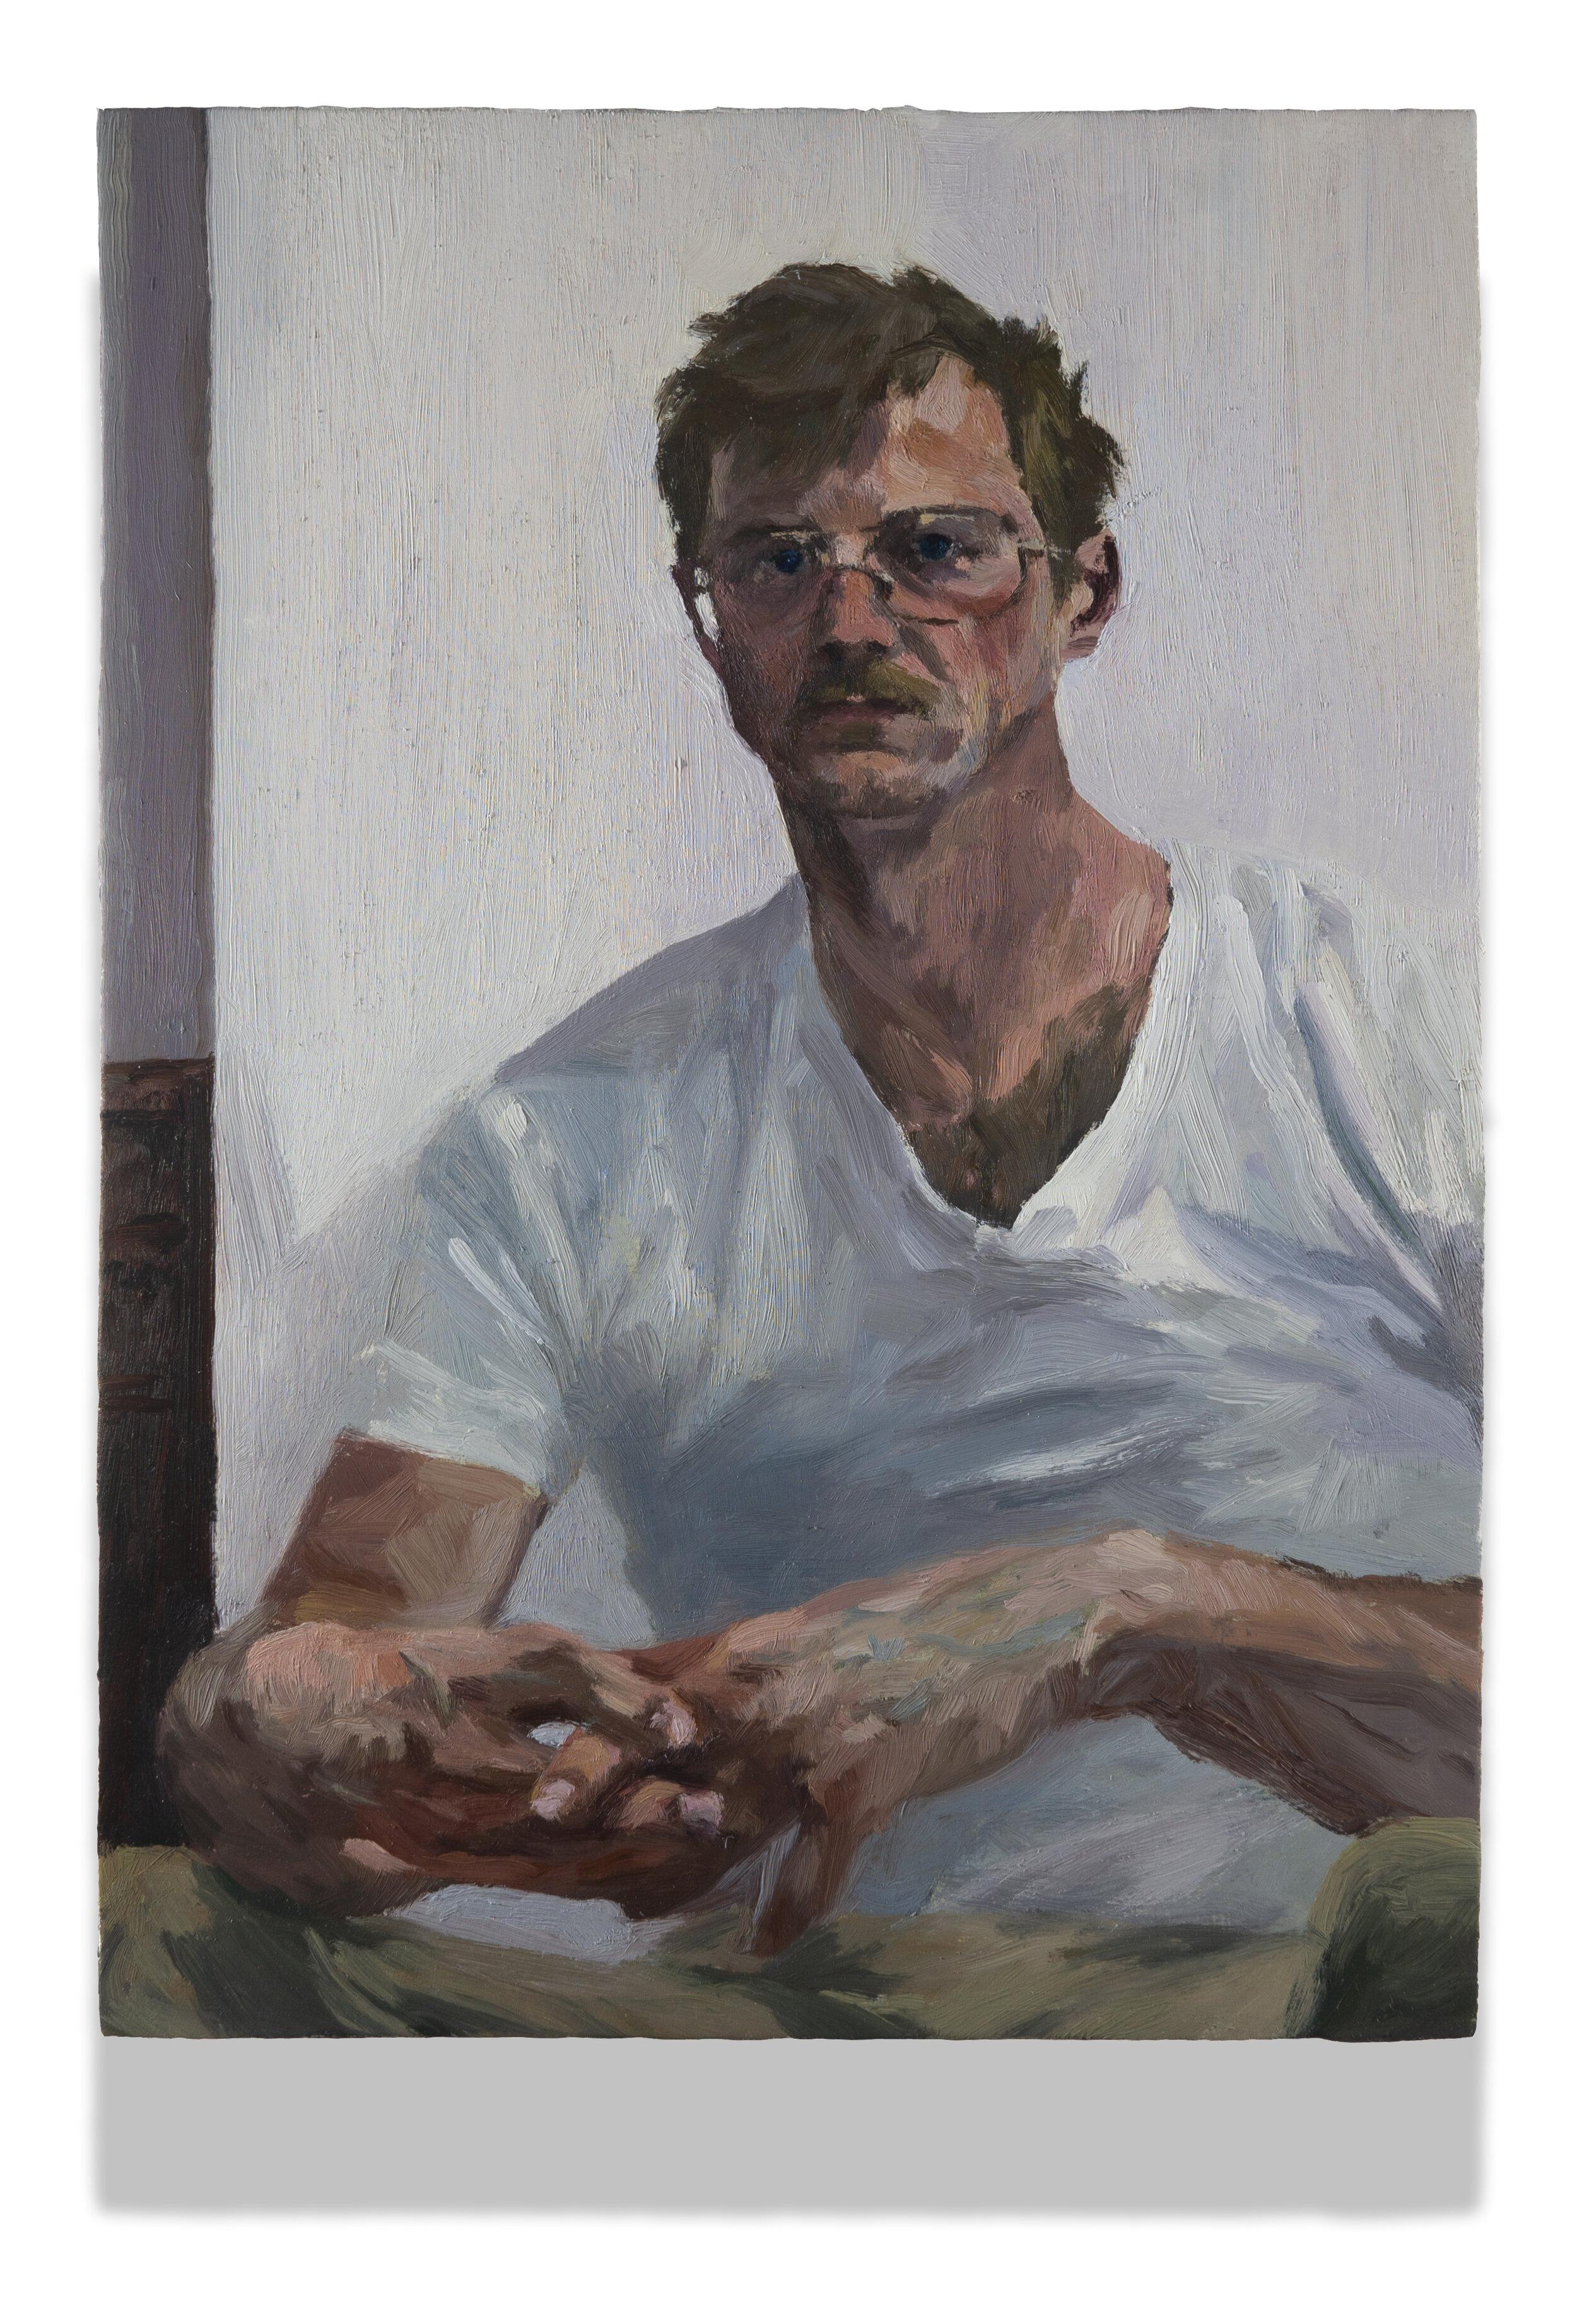 Self Portrait with Interlocked Hands